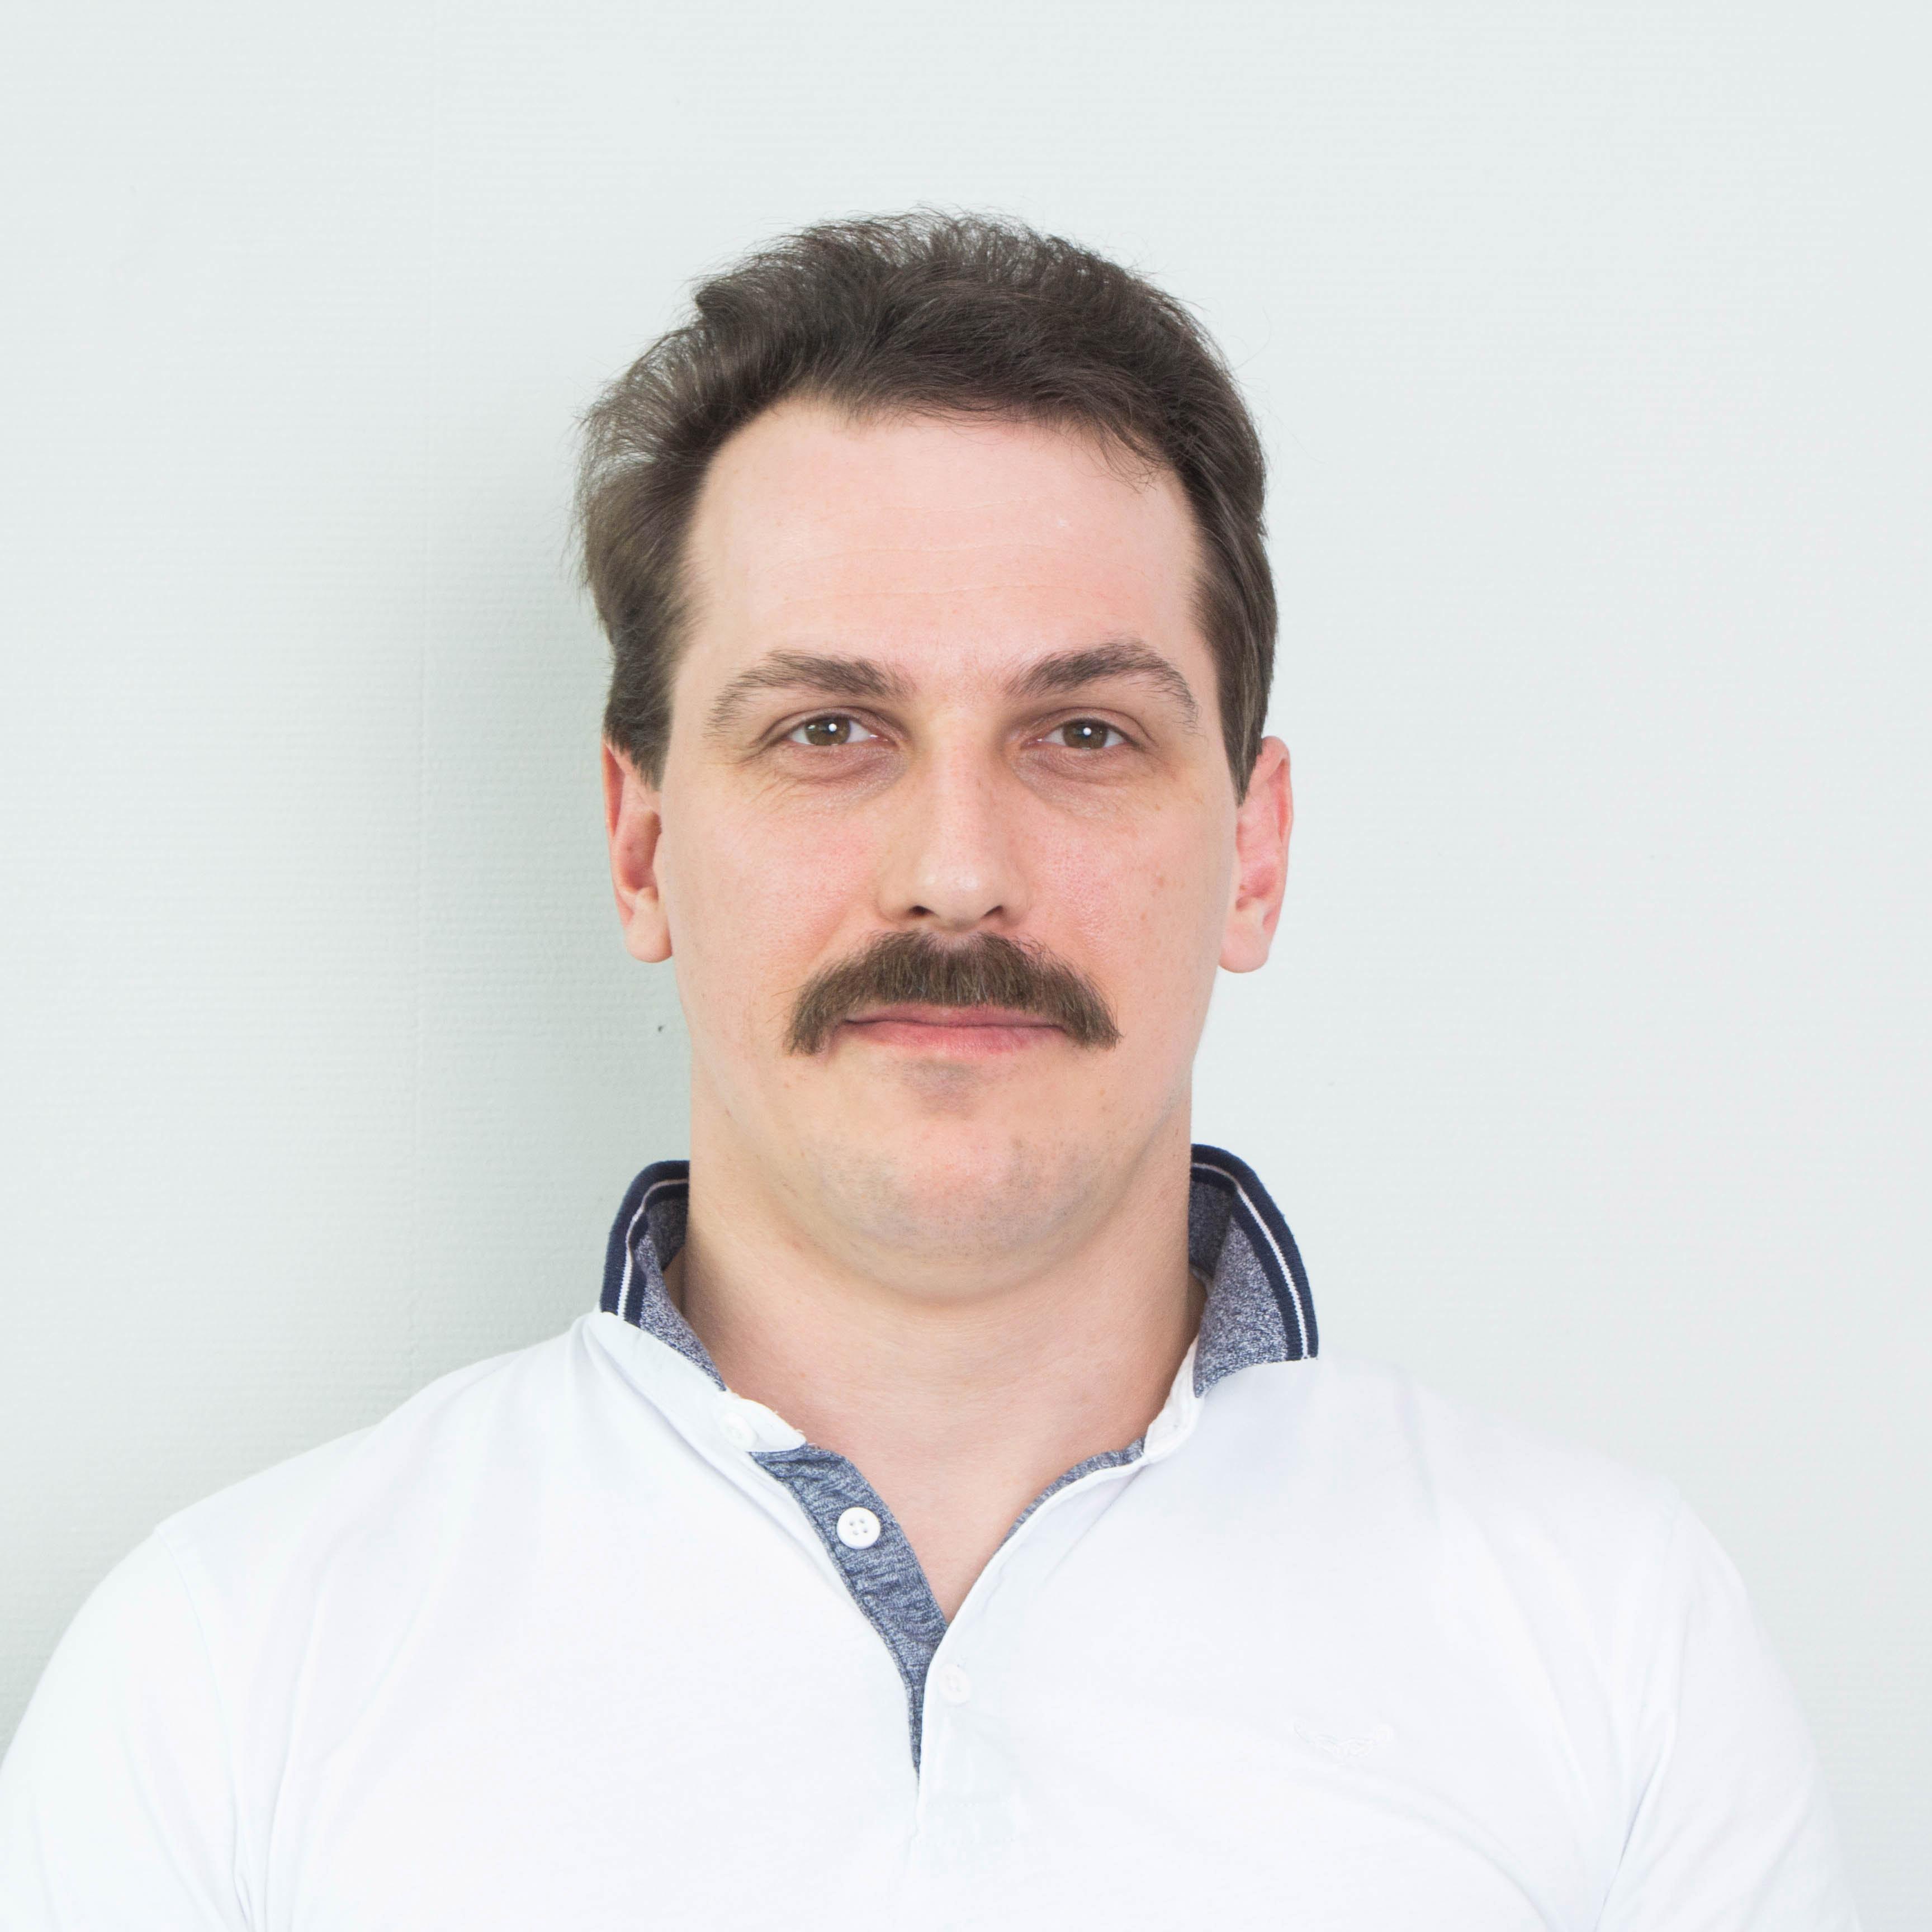 Дульнев Александр Александрович